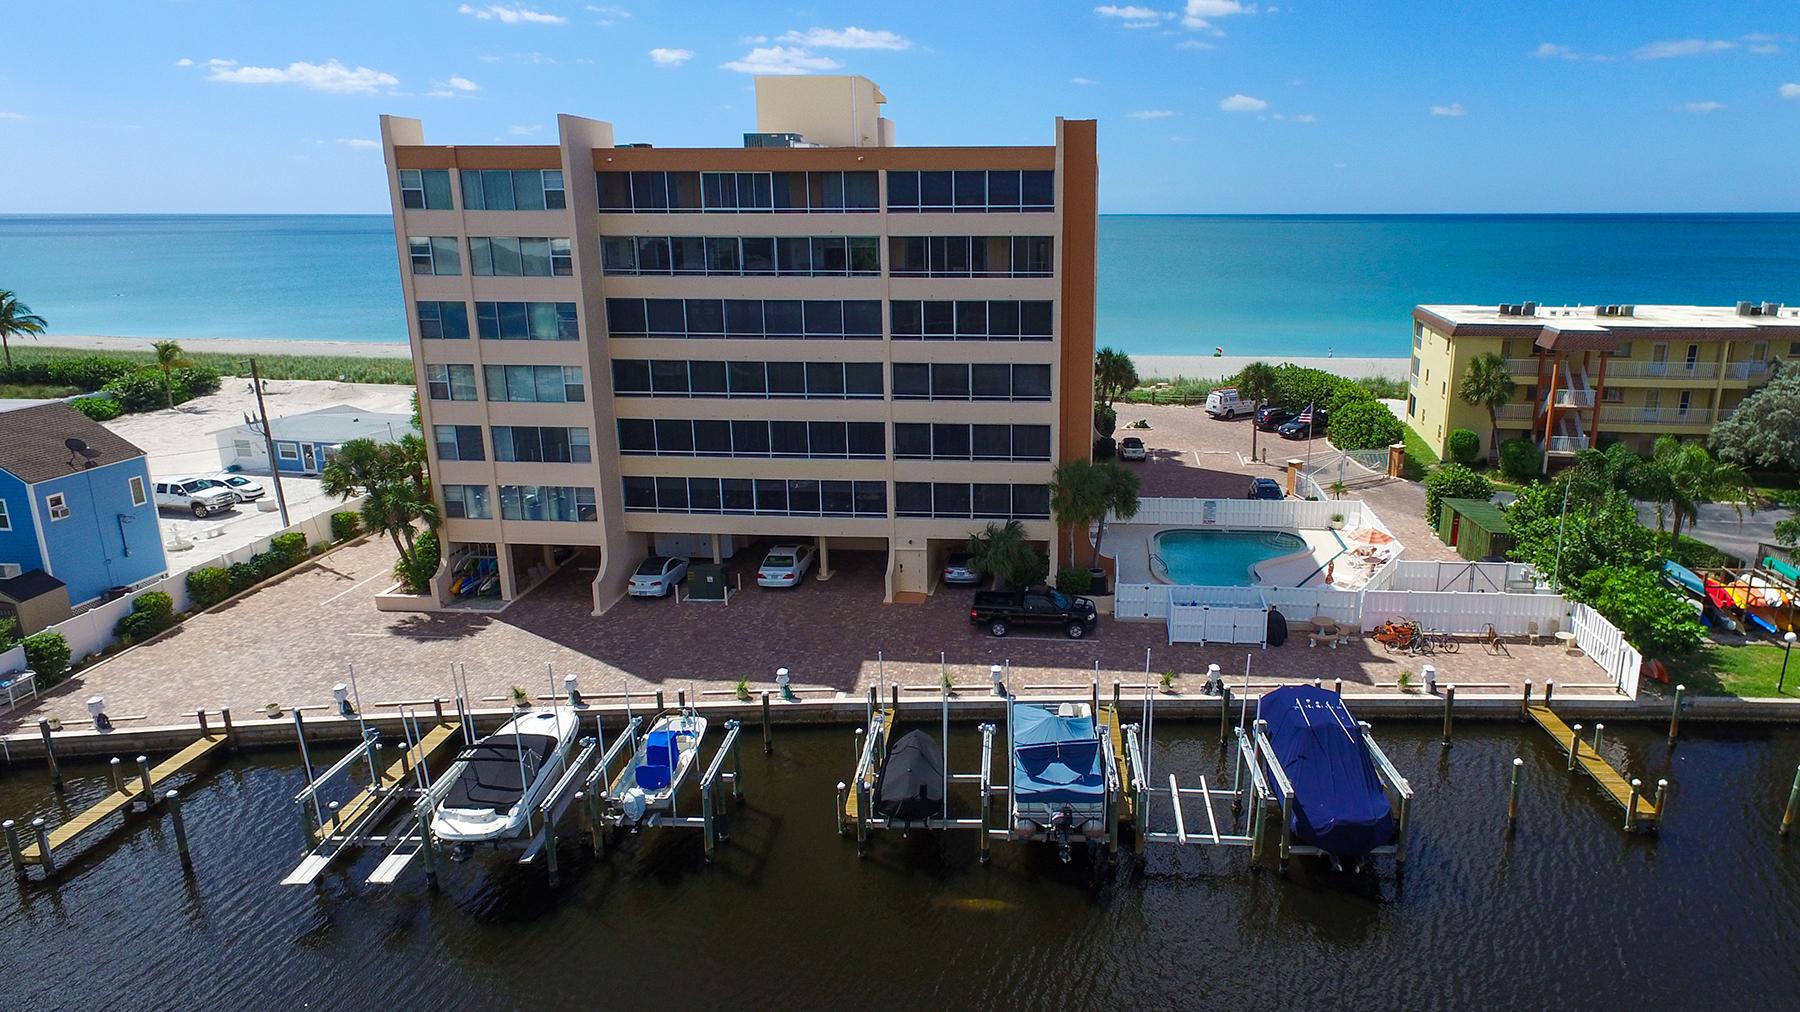 Condomínio para Venda às FISHERMAN'S HAVEN 9150 Blind Pass Rd 604 Sarasota, Florida, 34242 Estados Unidos